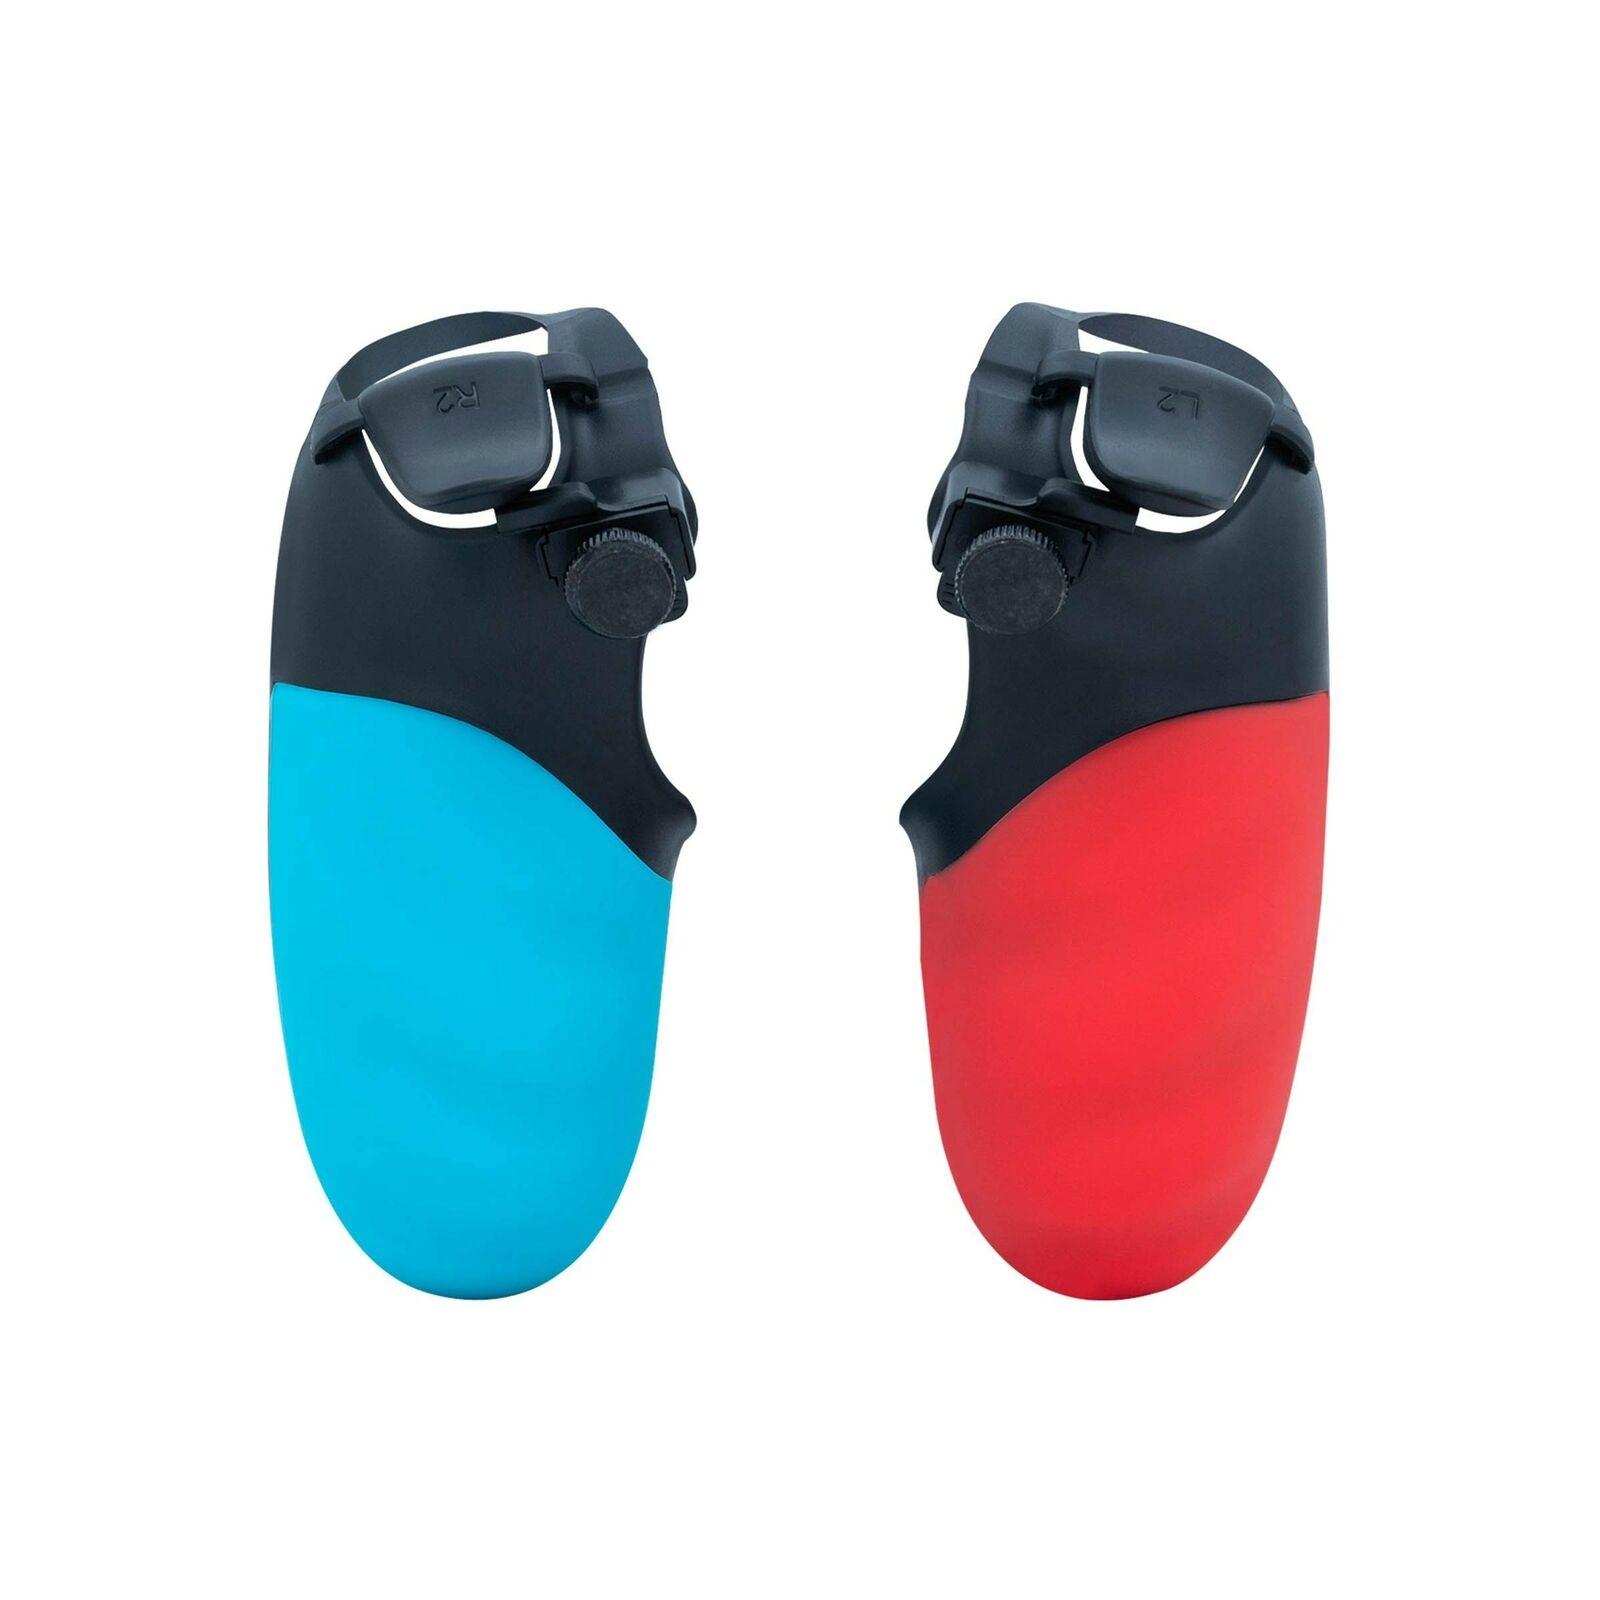 Mcbazel Honcam FPS Trigger Stop & Grip Cover for PS4 Controller - Red & Blue